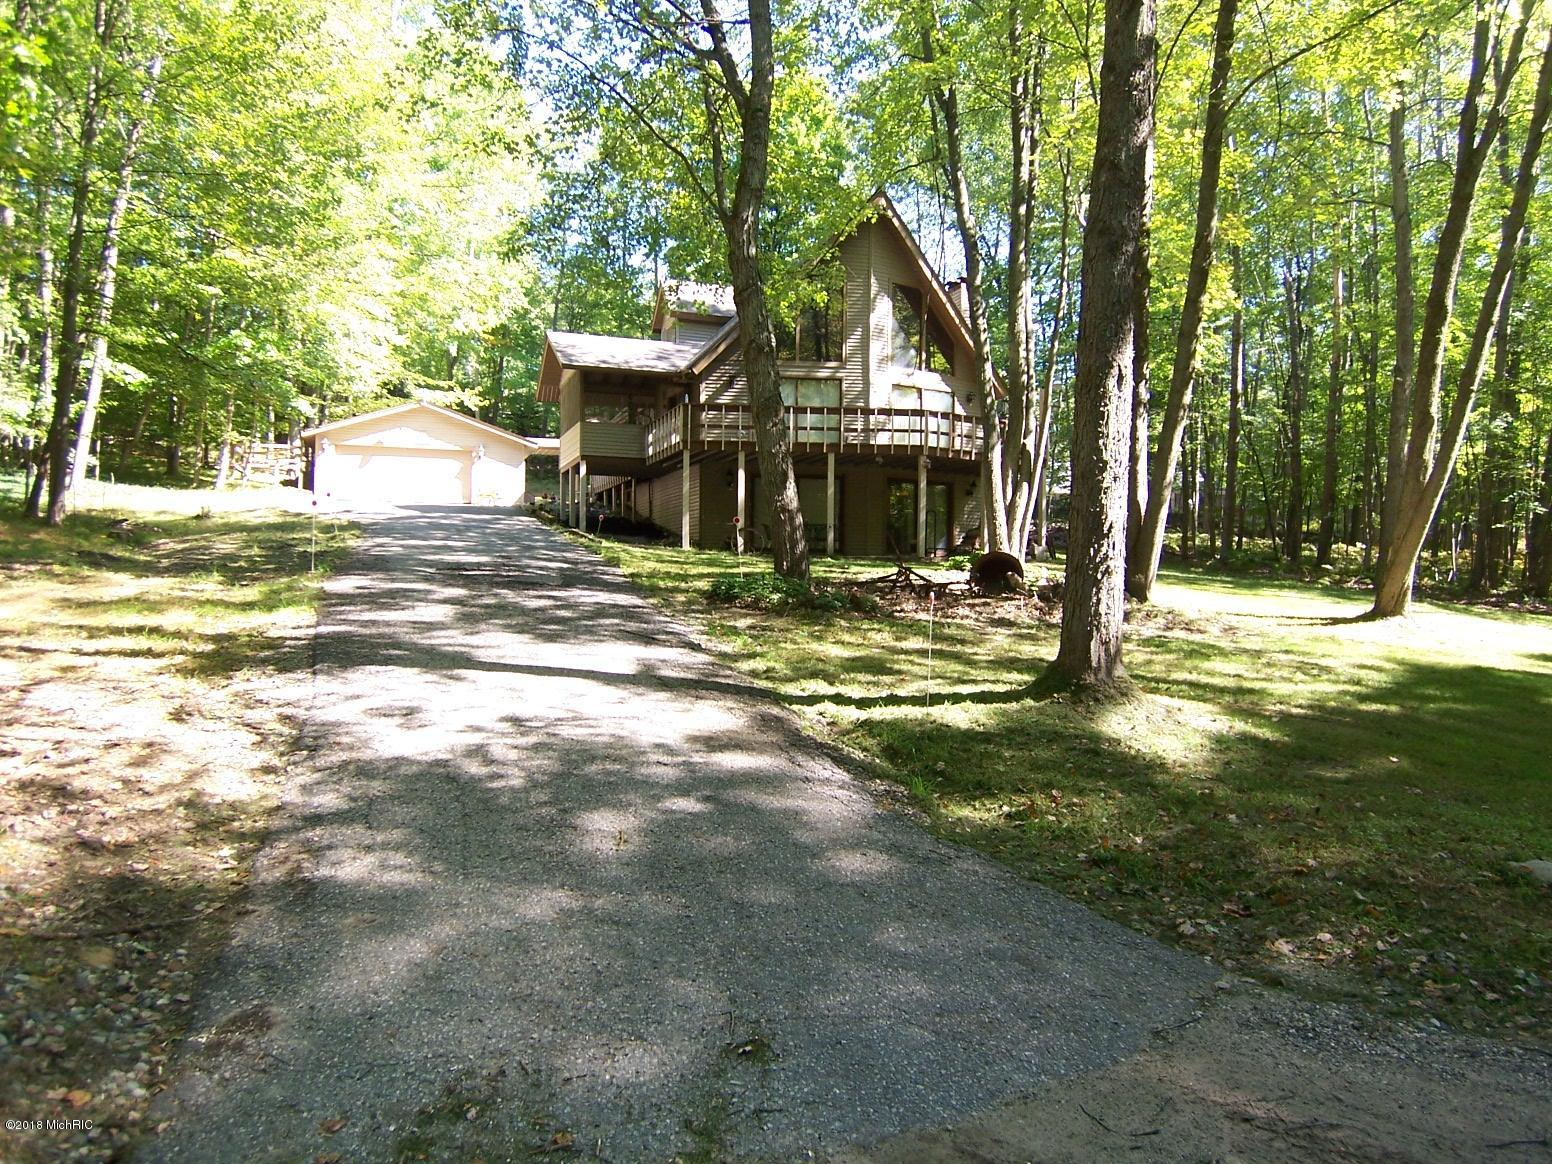 9840 Eagle Pass, Stanwood, 49346 - SOLD LISTING, MLS # 18047749    Greenridge Realty, Inc